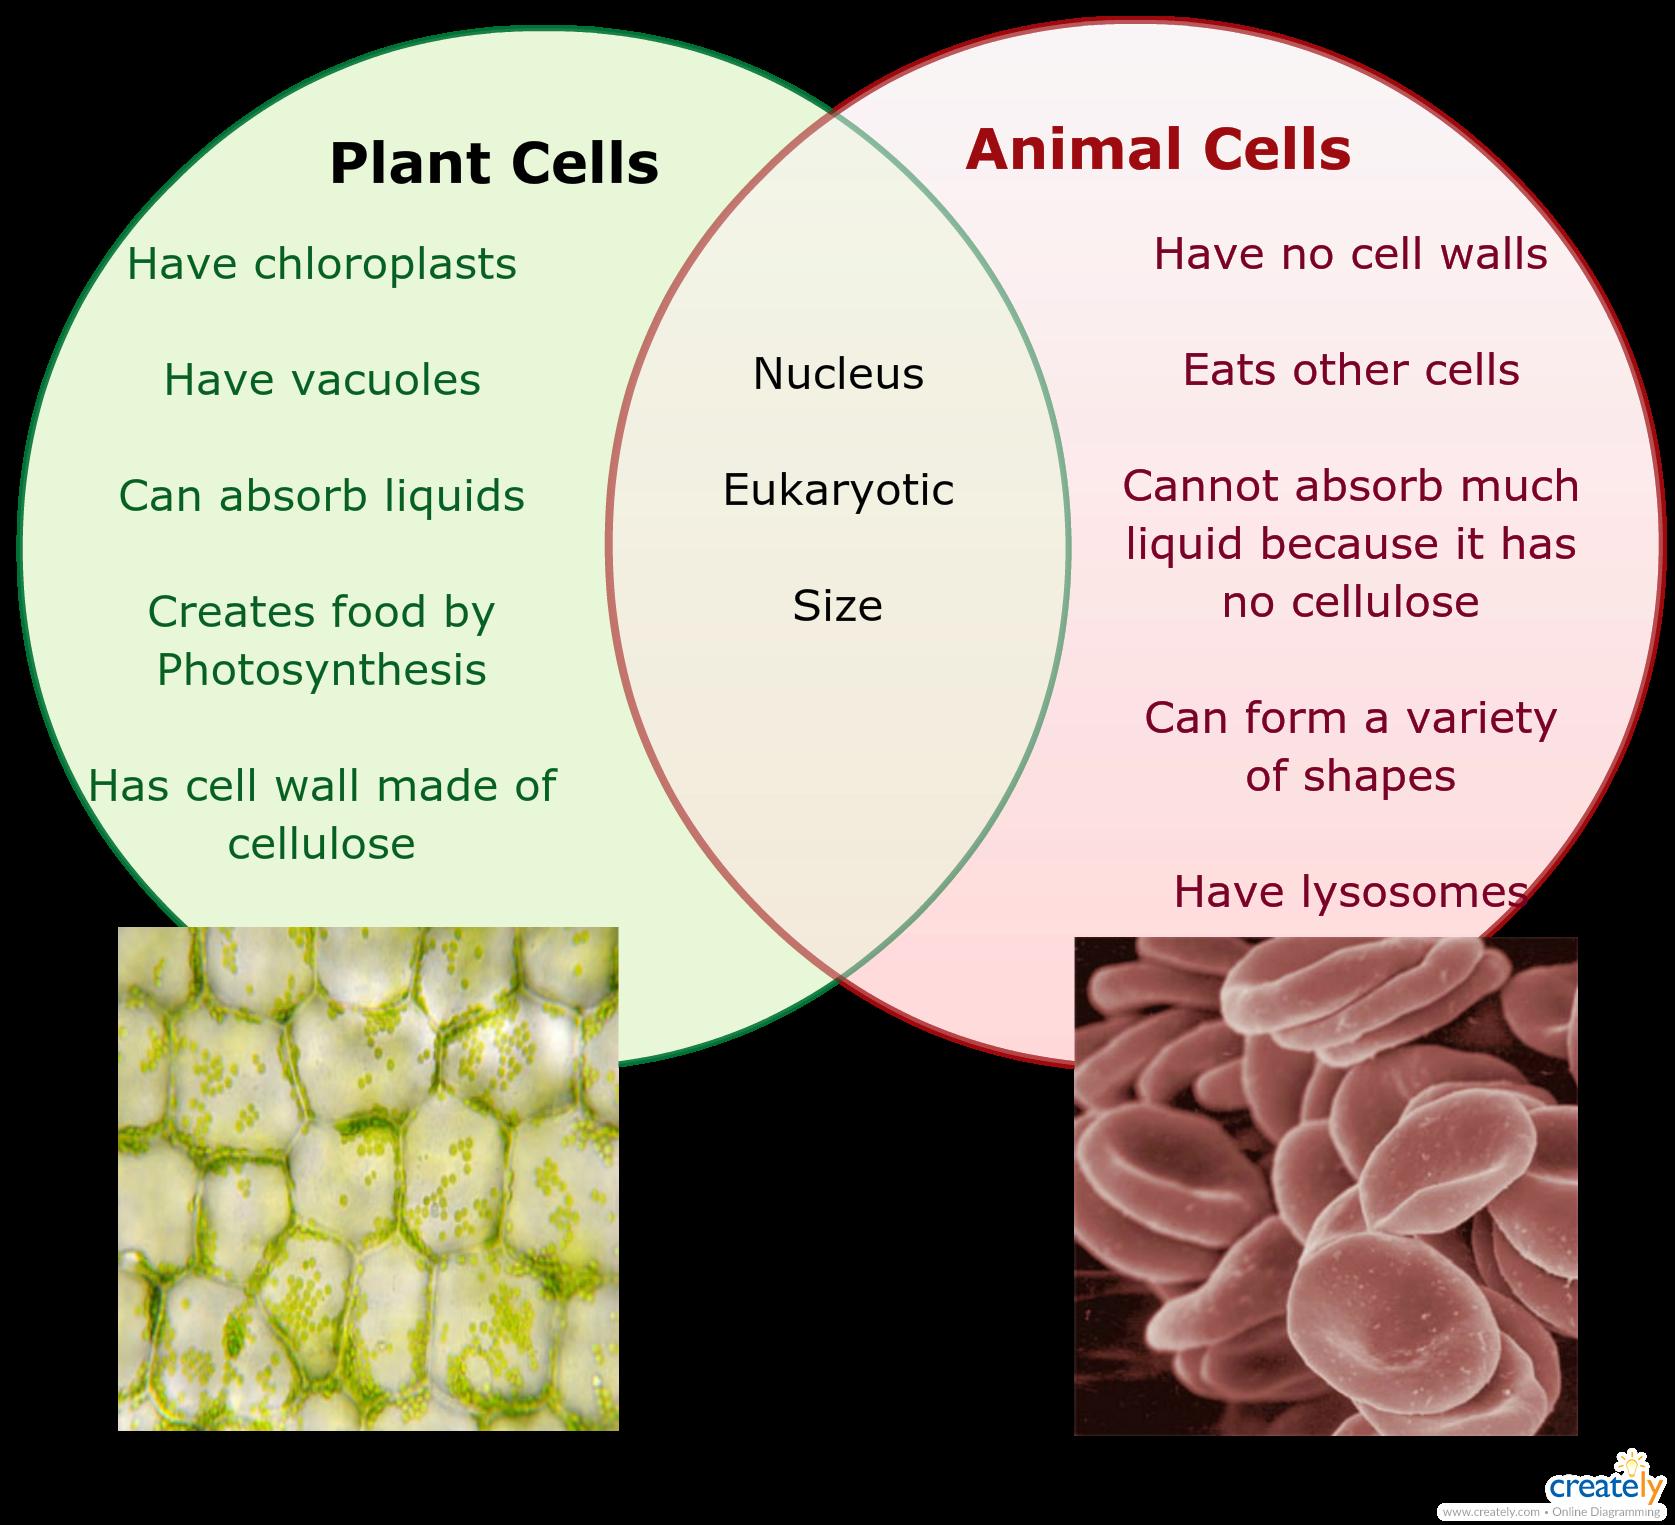 small resolution of plant vs animal cells venn diagram for educational purposes venn diagram